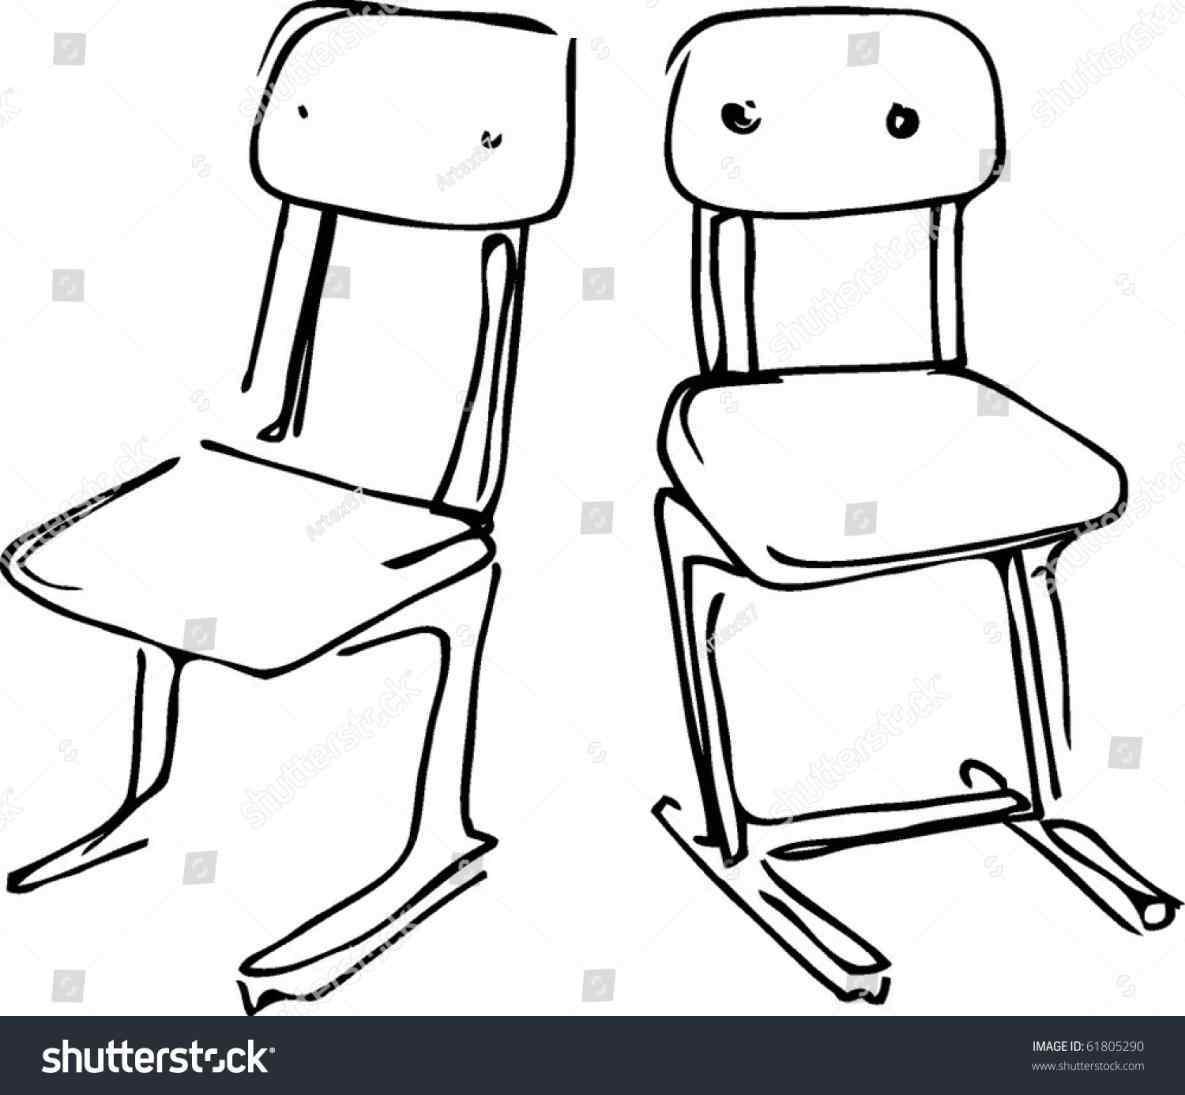 1185x1095 Design Sketches Xqnlinfo Little Student Stock Vector Shutterstock